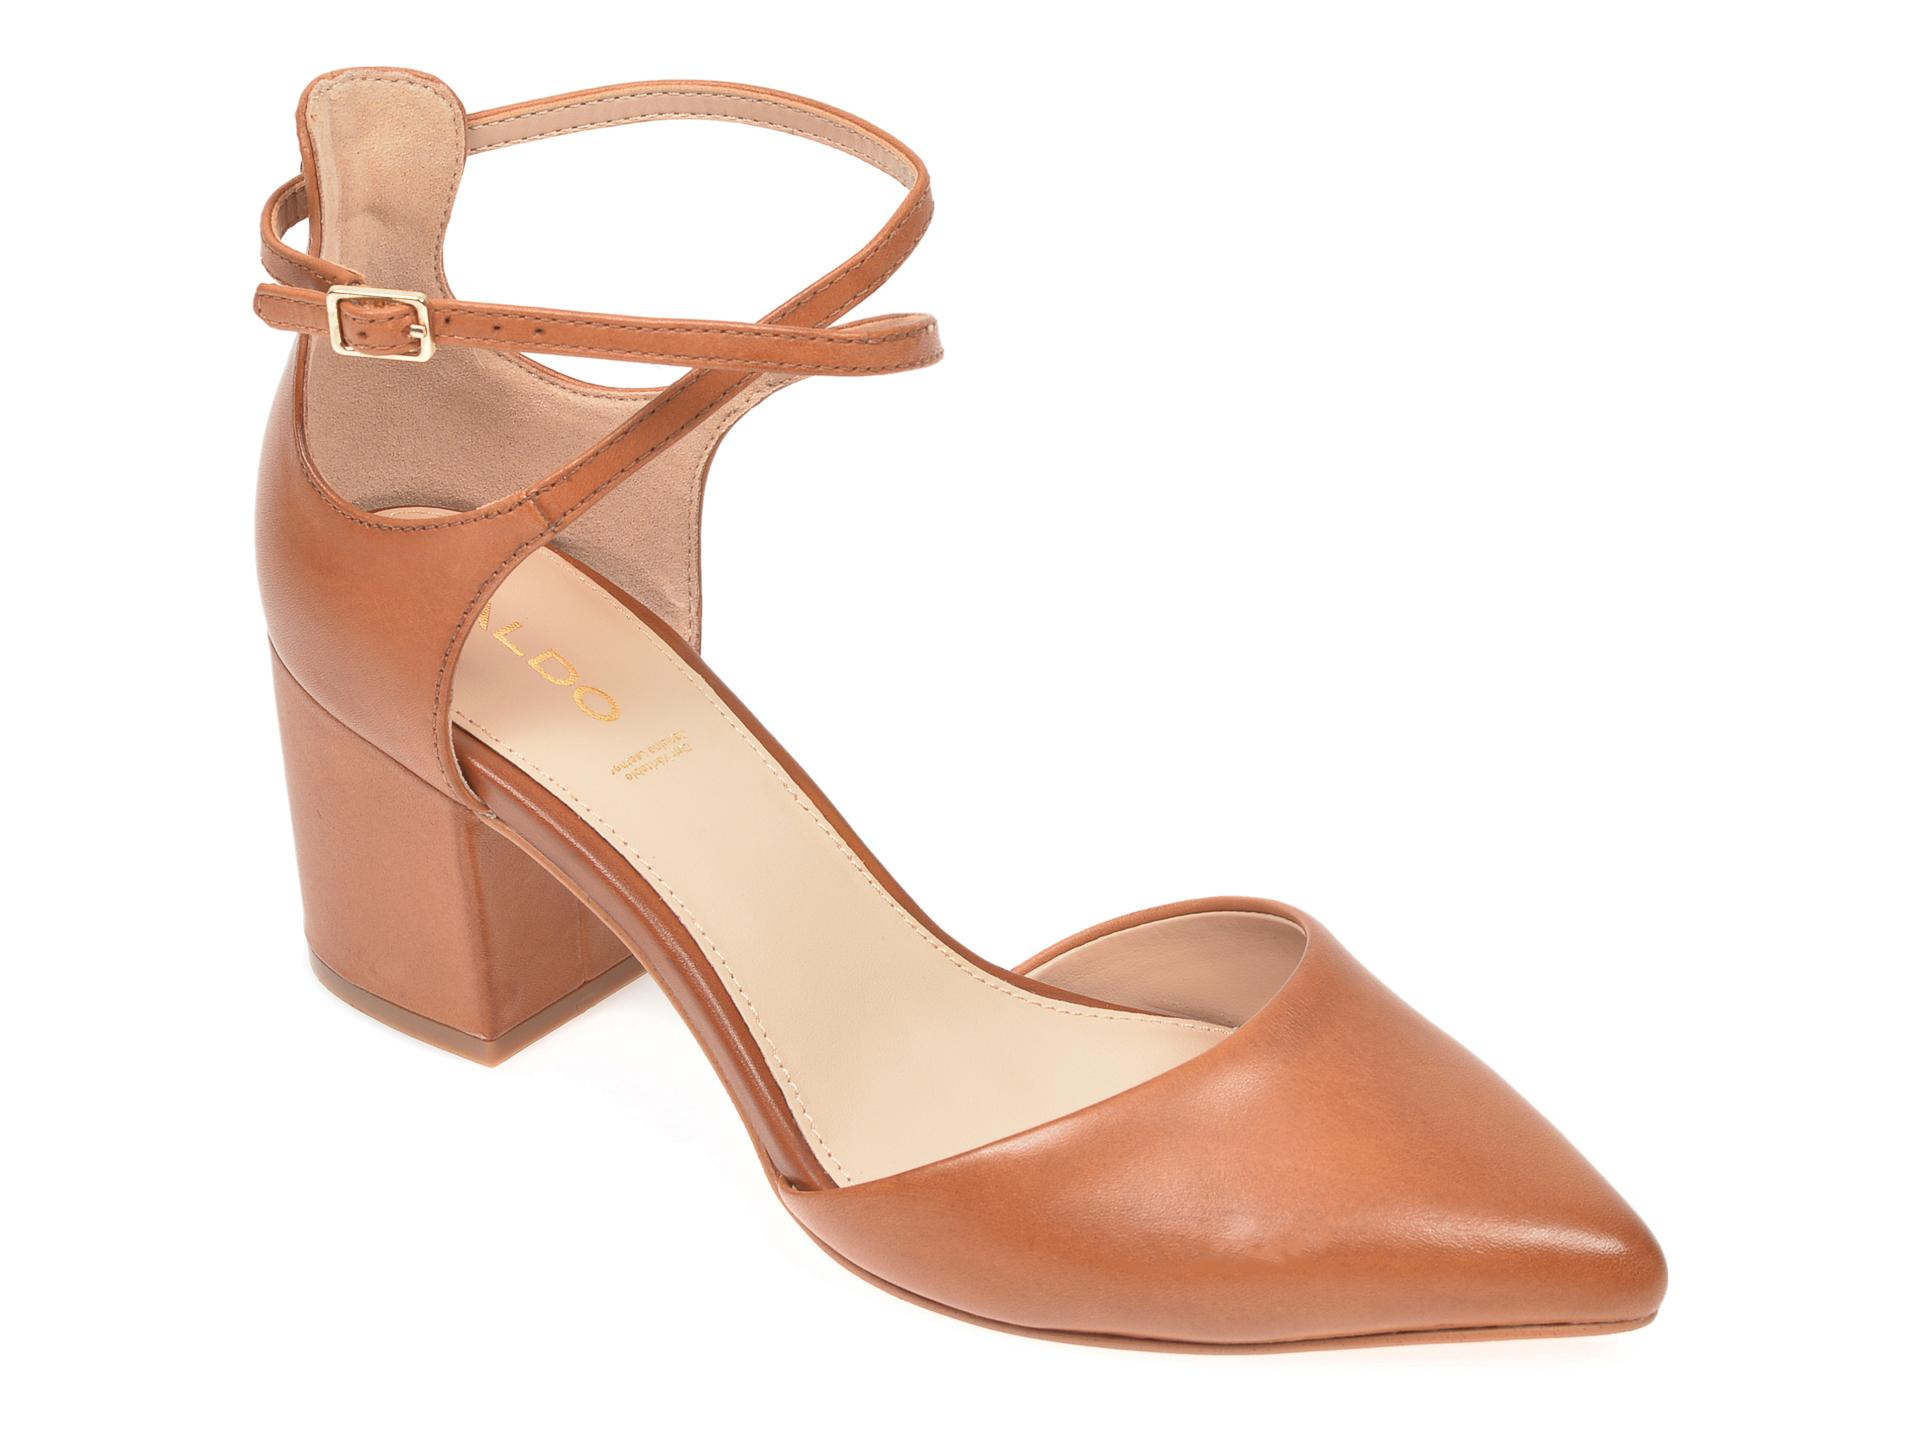 Pantofi ALDO maro, Brookshear220, din piele naturala imagine